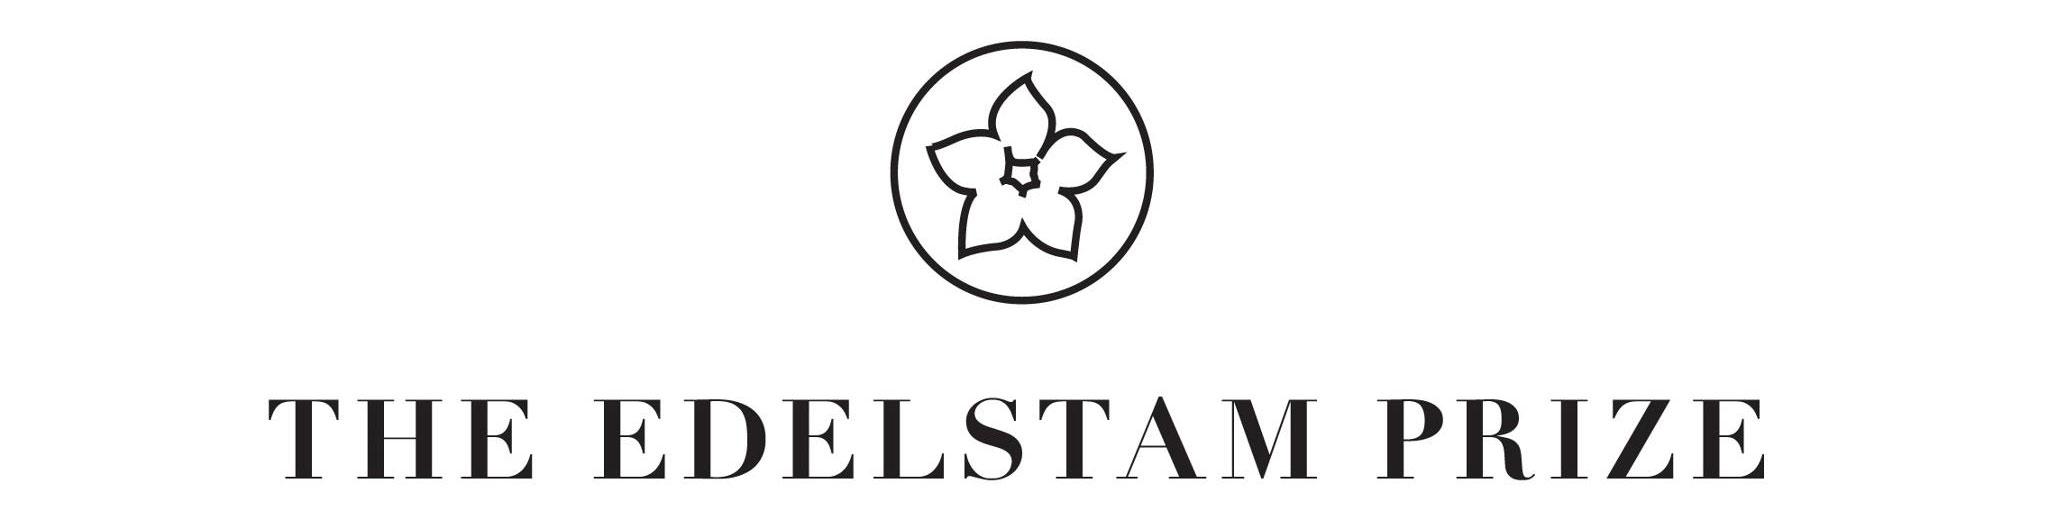 The Edelstam Prize